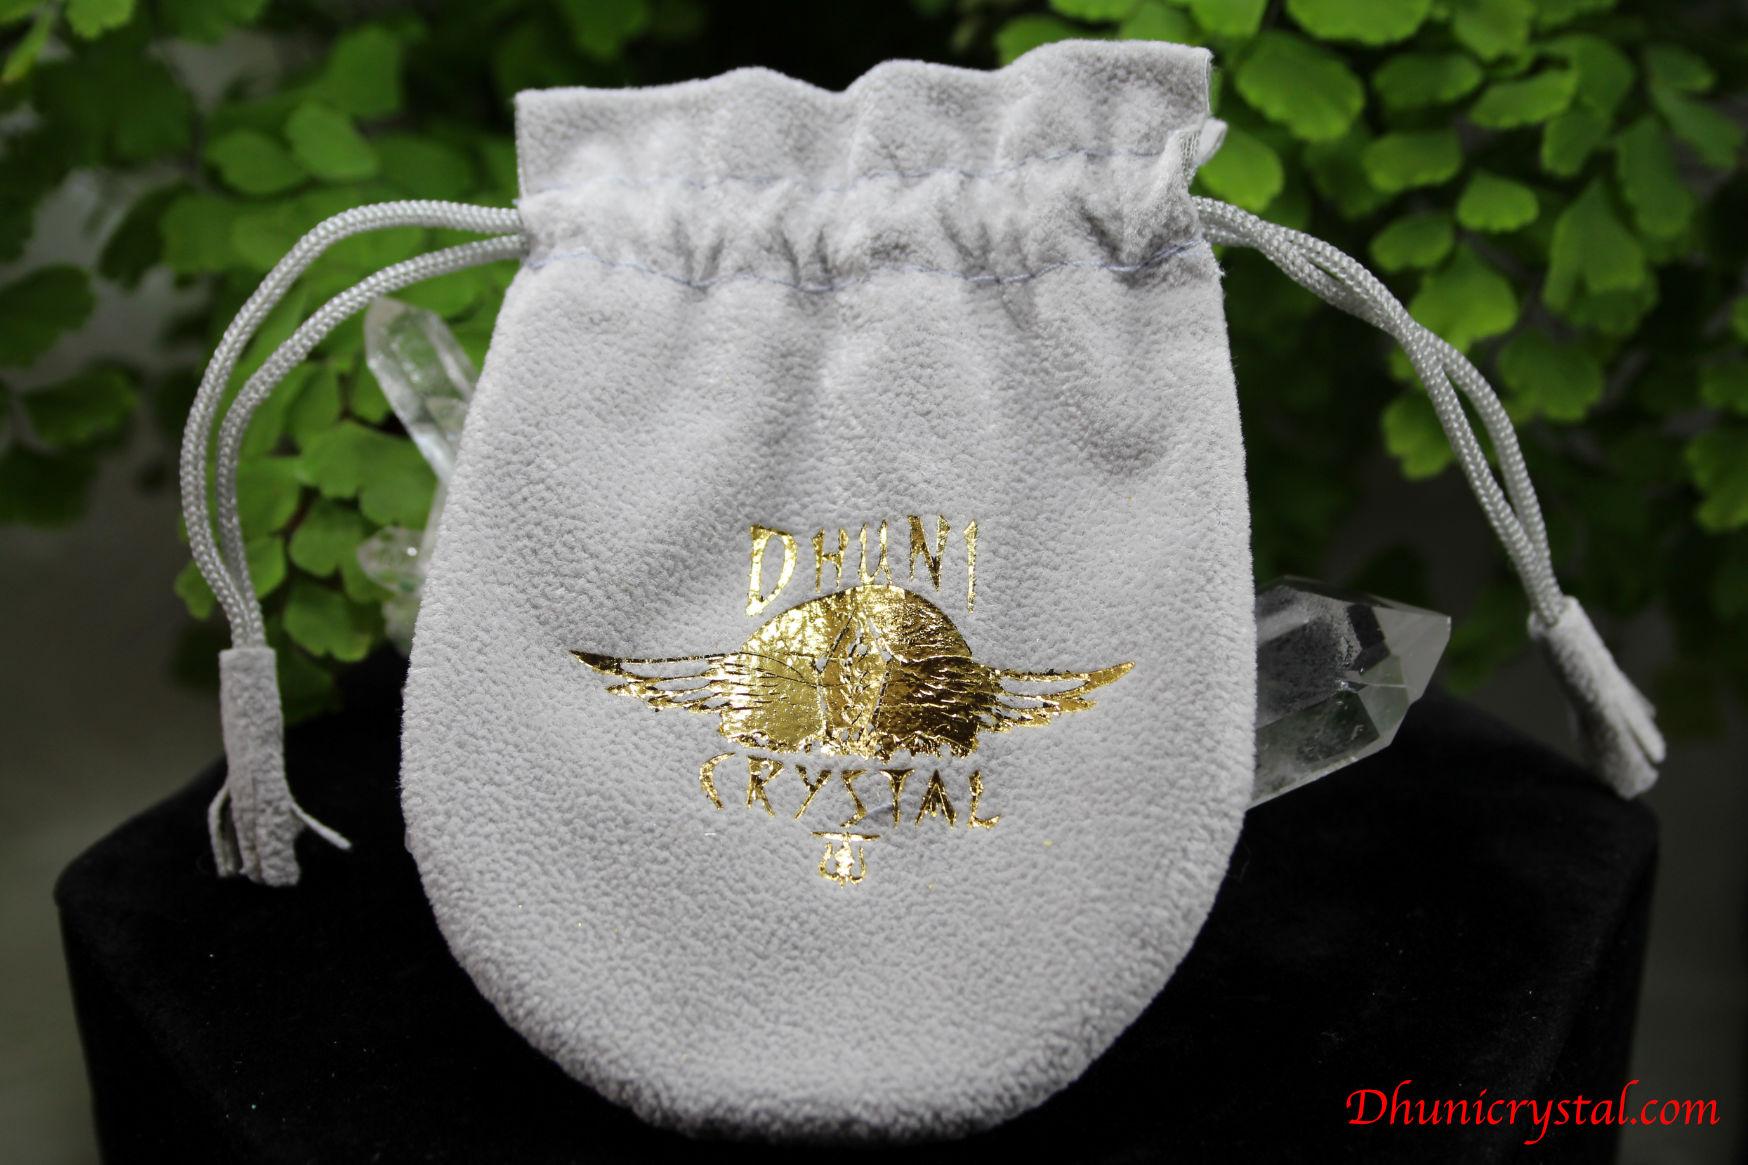 Dhuni crystal オリジナルぽち袋